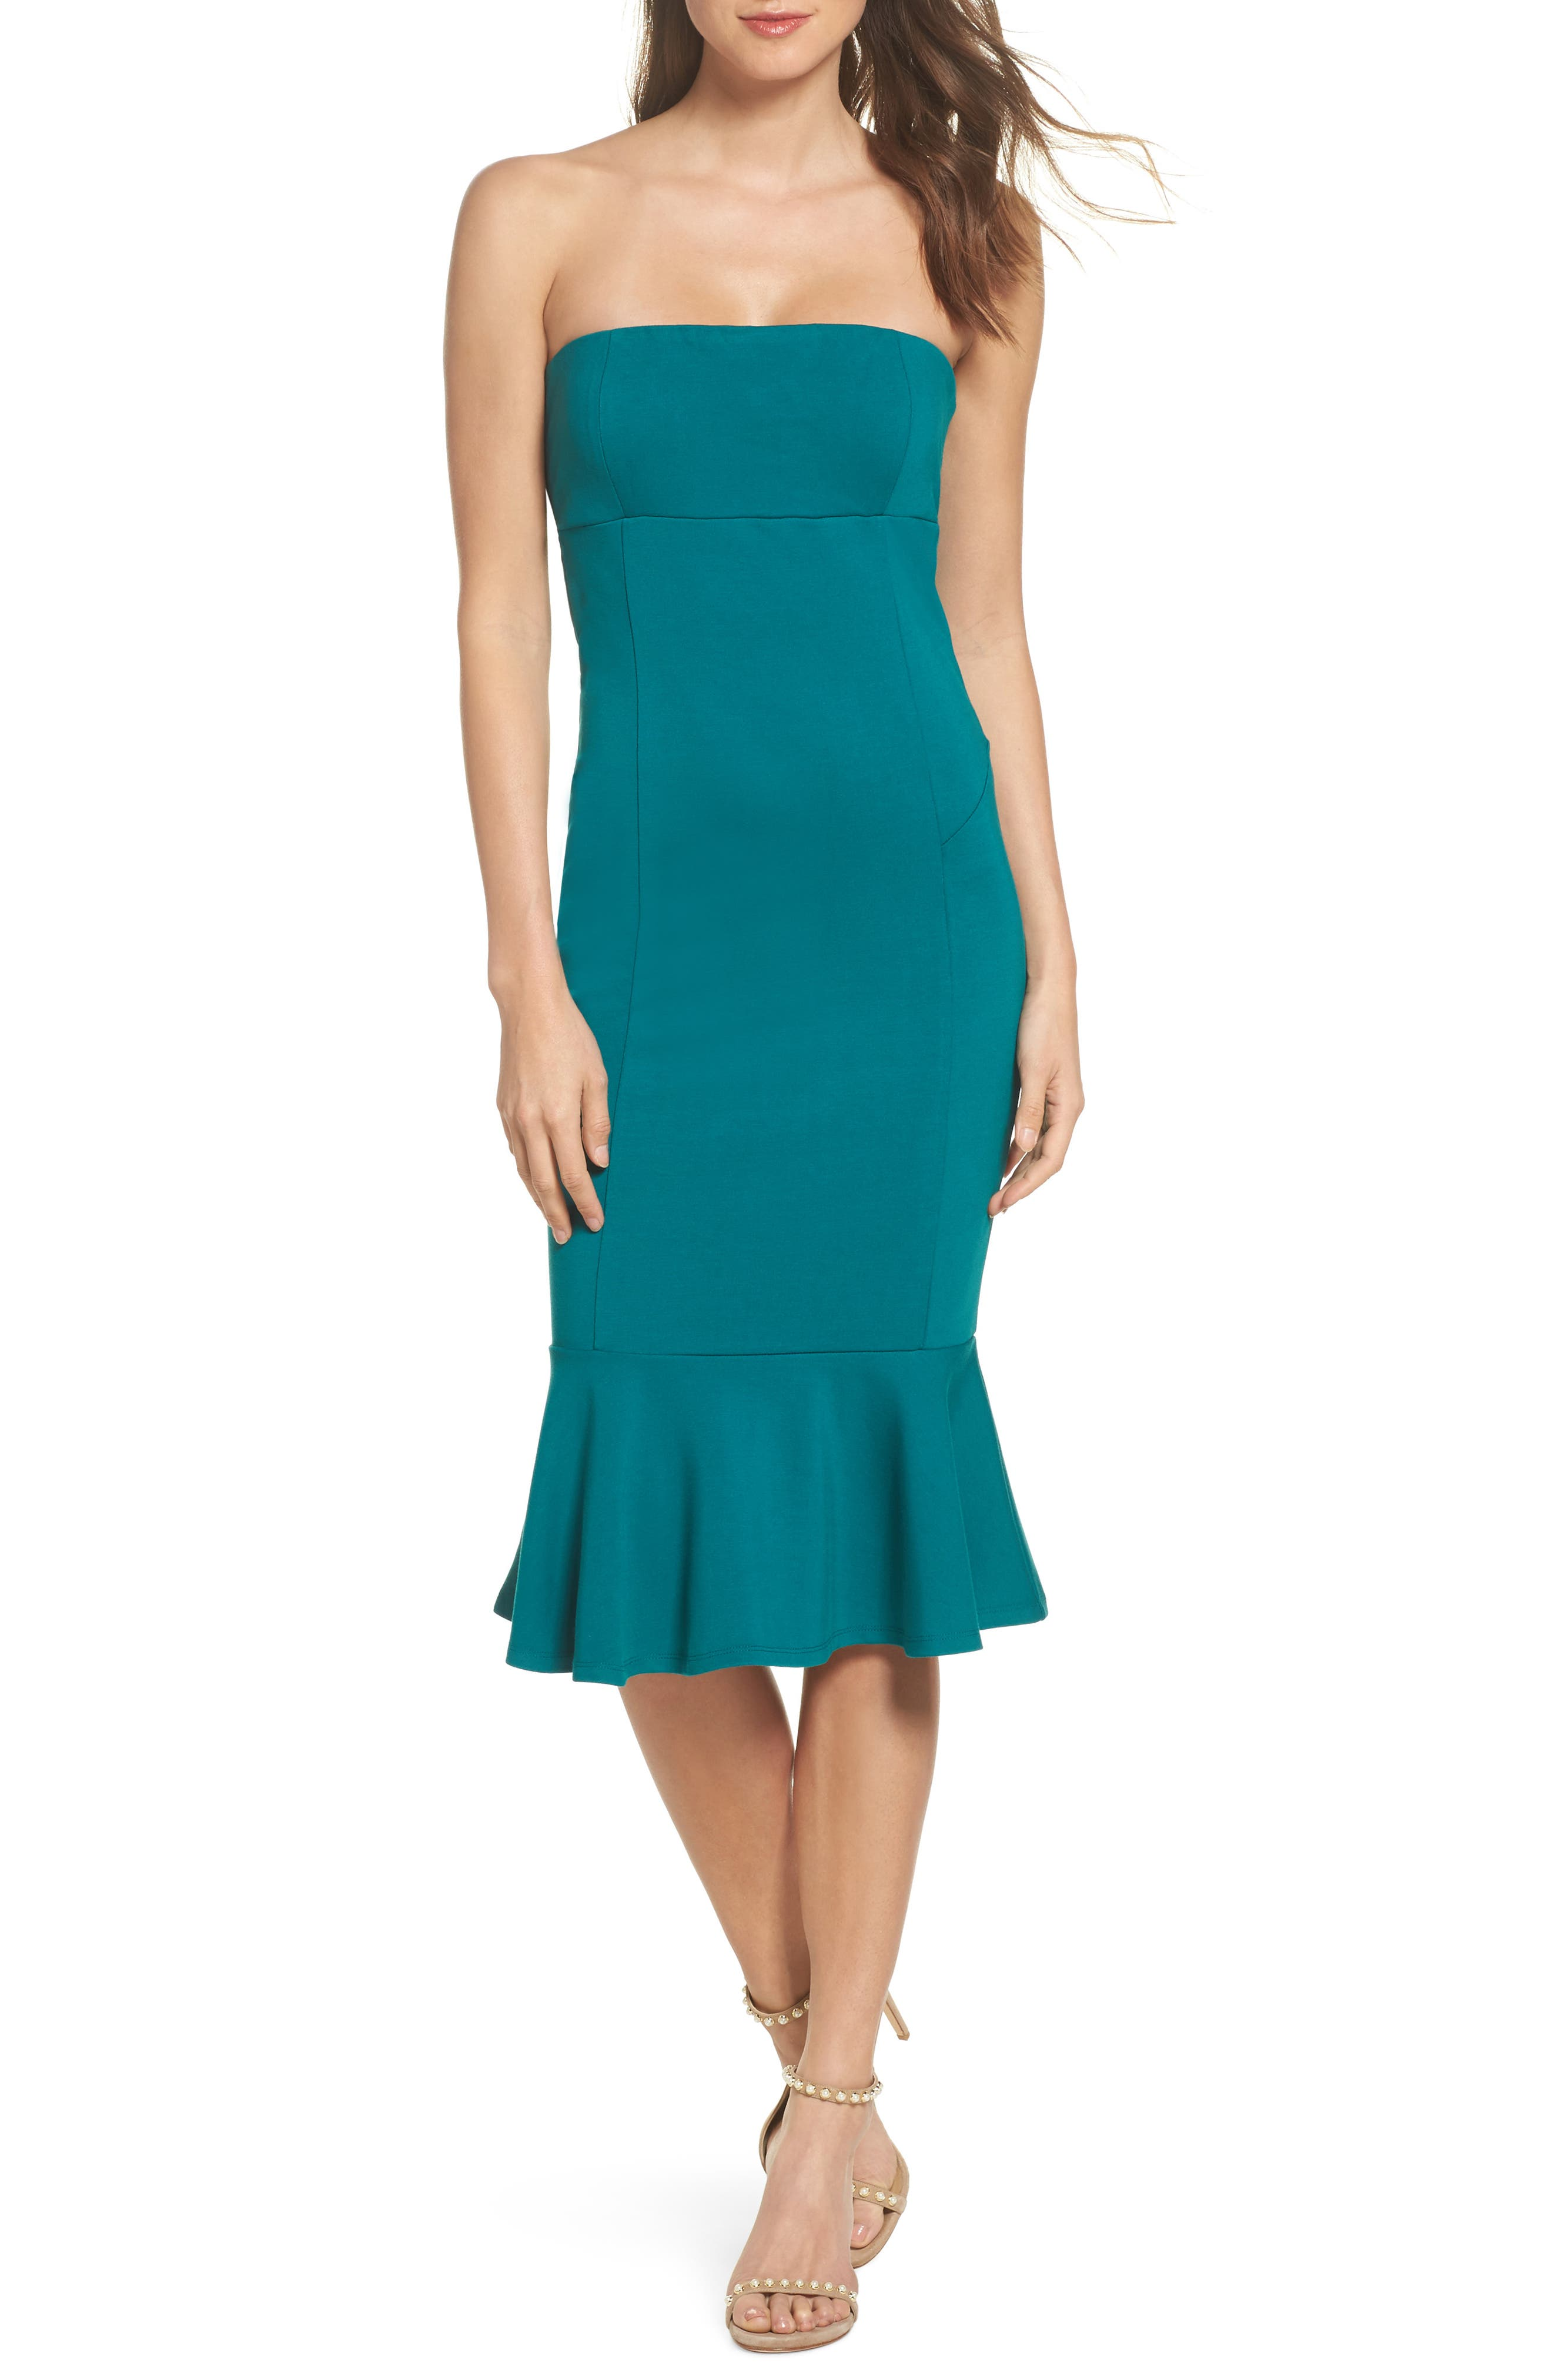 Zabrina Strapless Dress,                             Main thumbnail 1, color,                             302